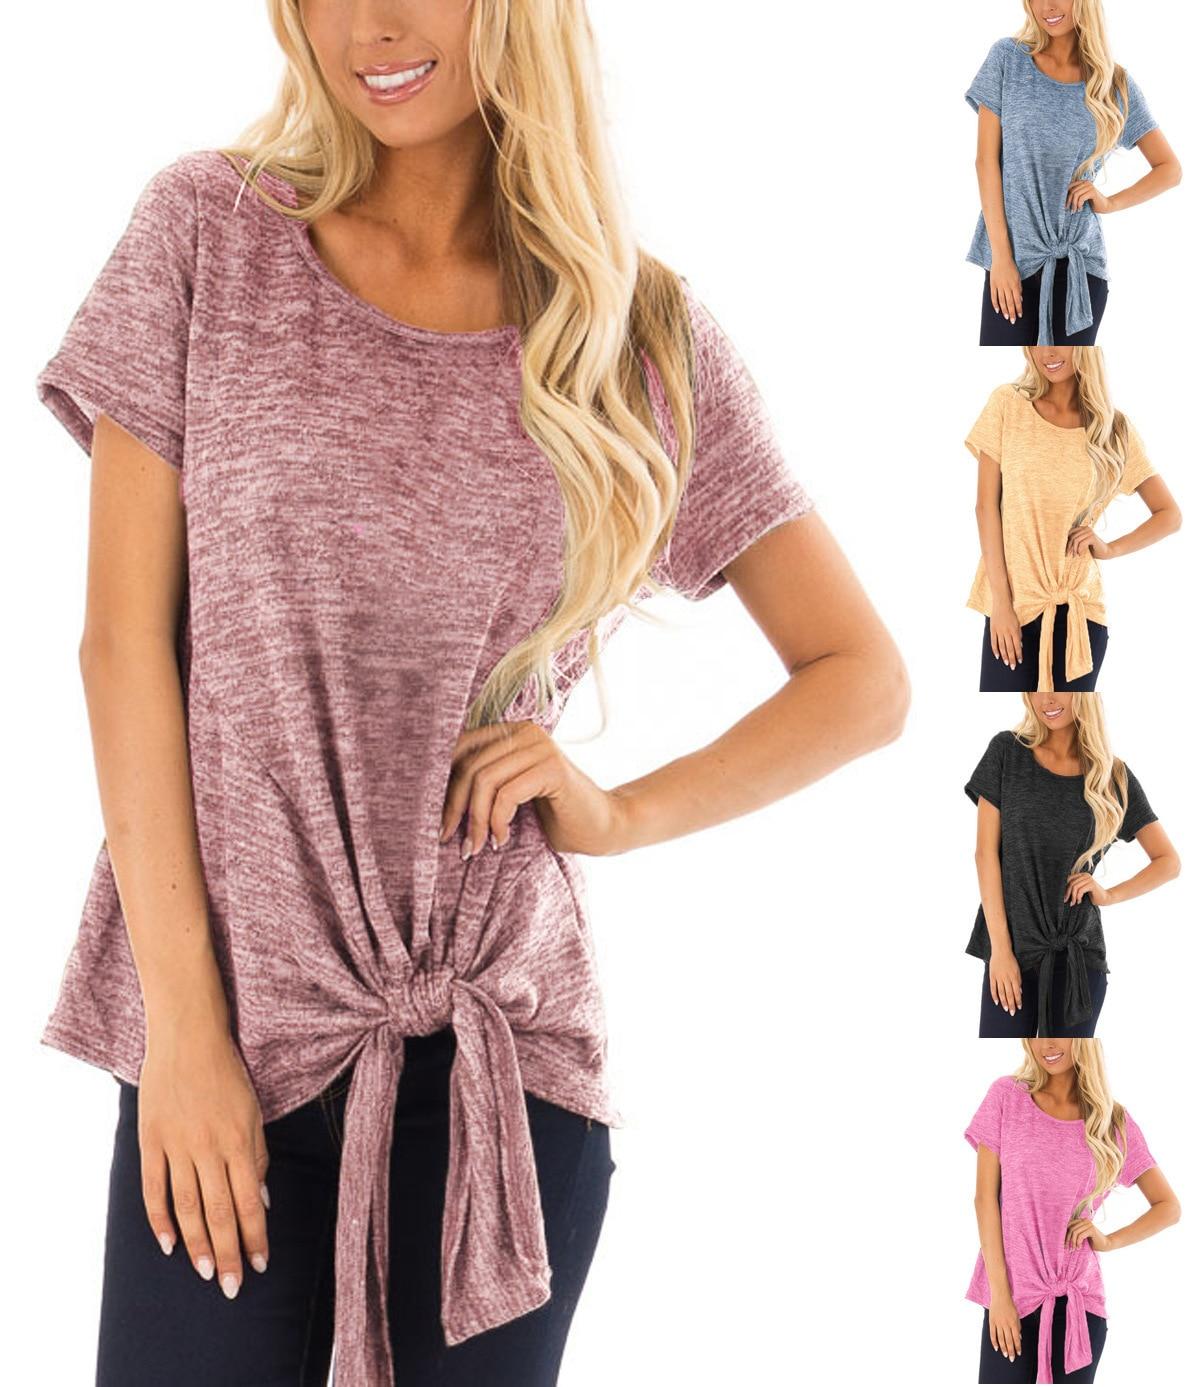 2020summer new hot sale explosive American fashion plus size t-shirt irregular tshirt unif gothic shein short-sleeved top women